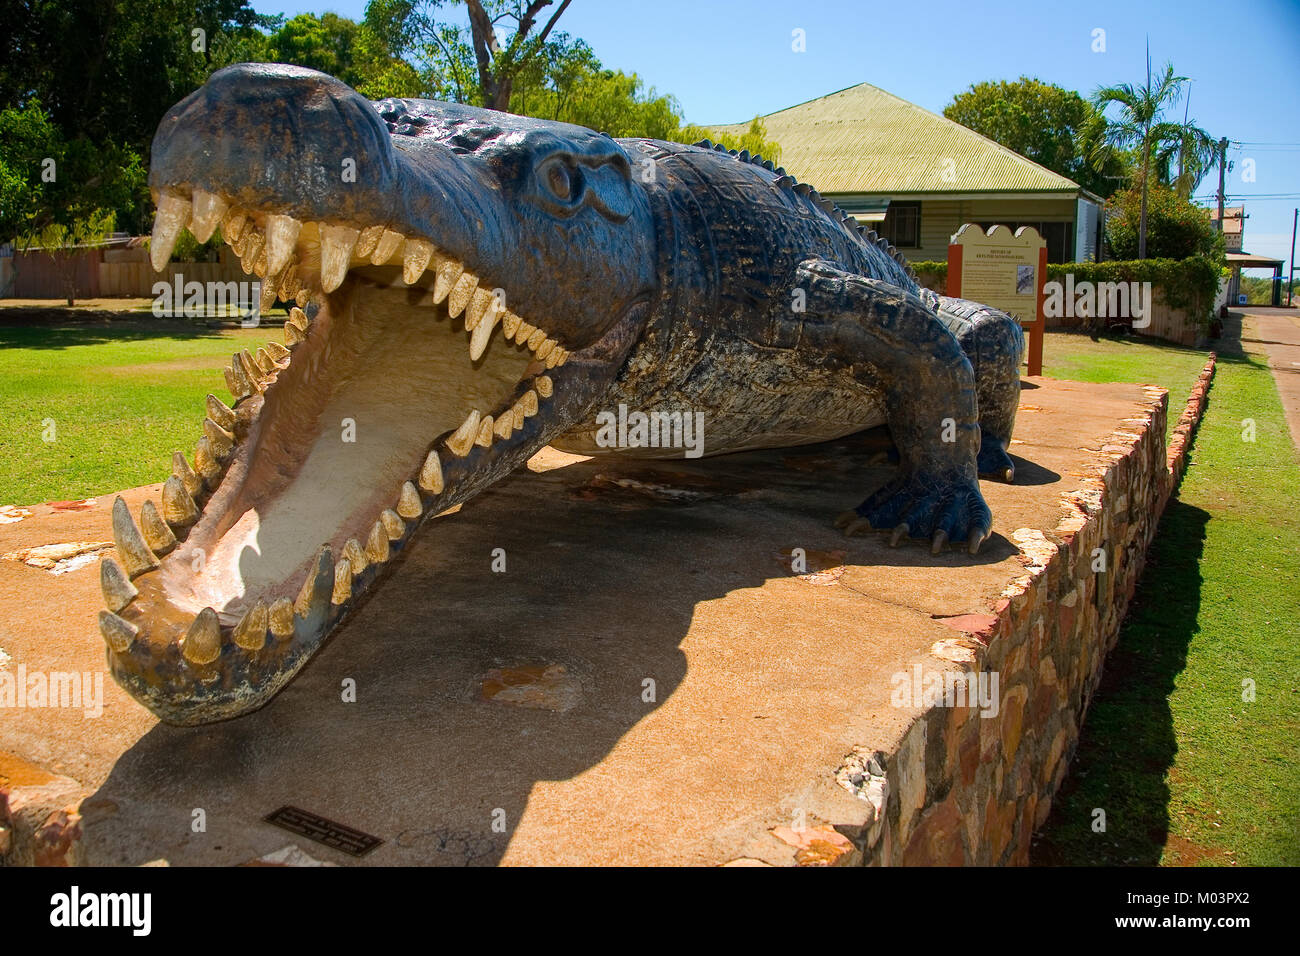 Kyrs the Crocodile, 8.63m, Normanton North Queensland - Stock Image